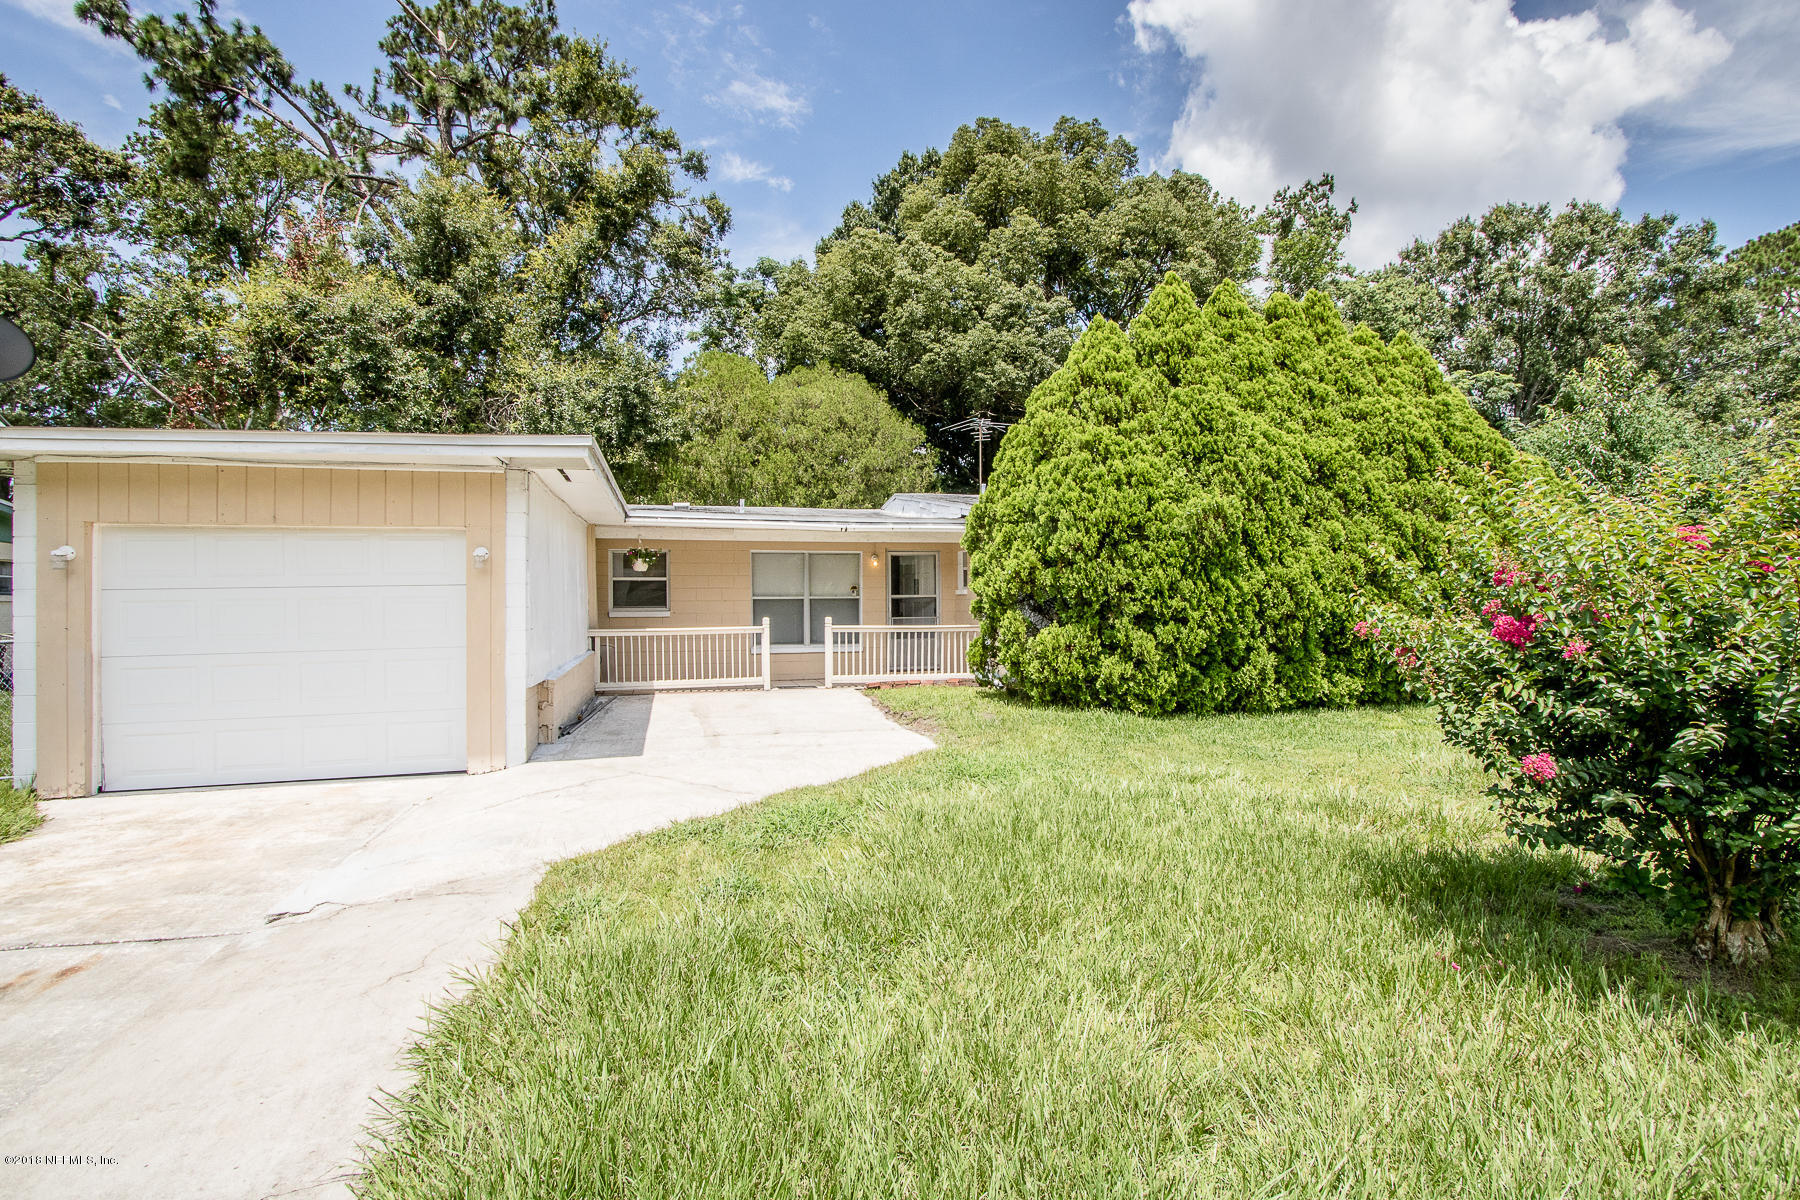 4748 REDSTONE, JACKSONVILLE, FLORIDA 32210, 3 Bedrooms Bedrooms, ,2 BathroomsBathrooms,Residential - single family,For sale,REDSTONE,946202